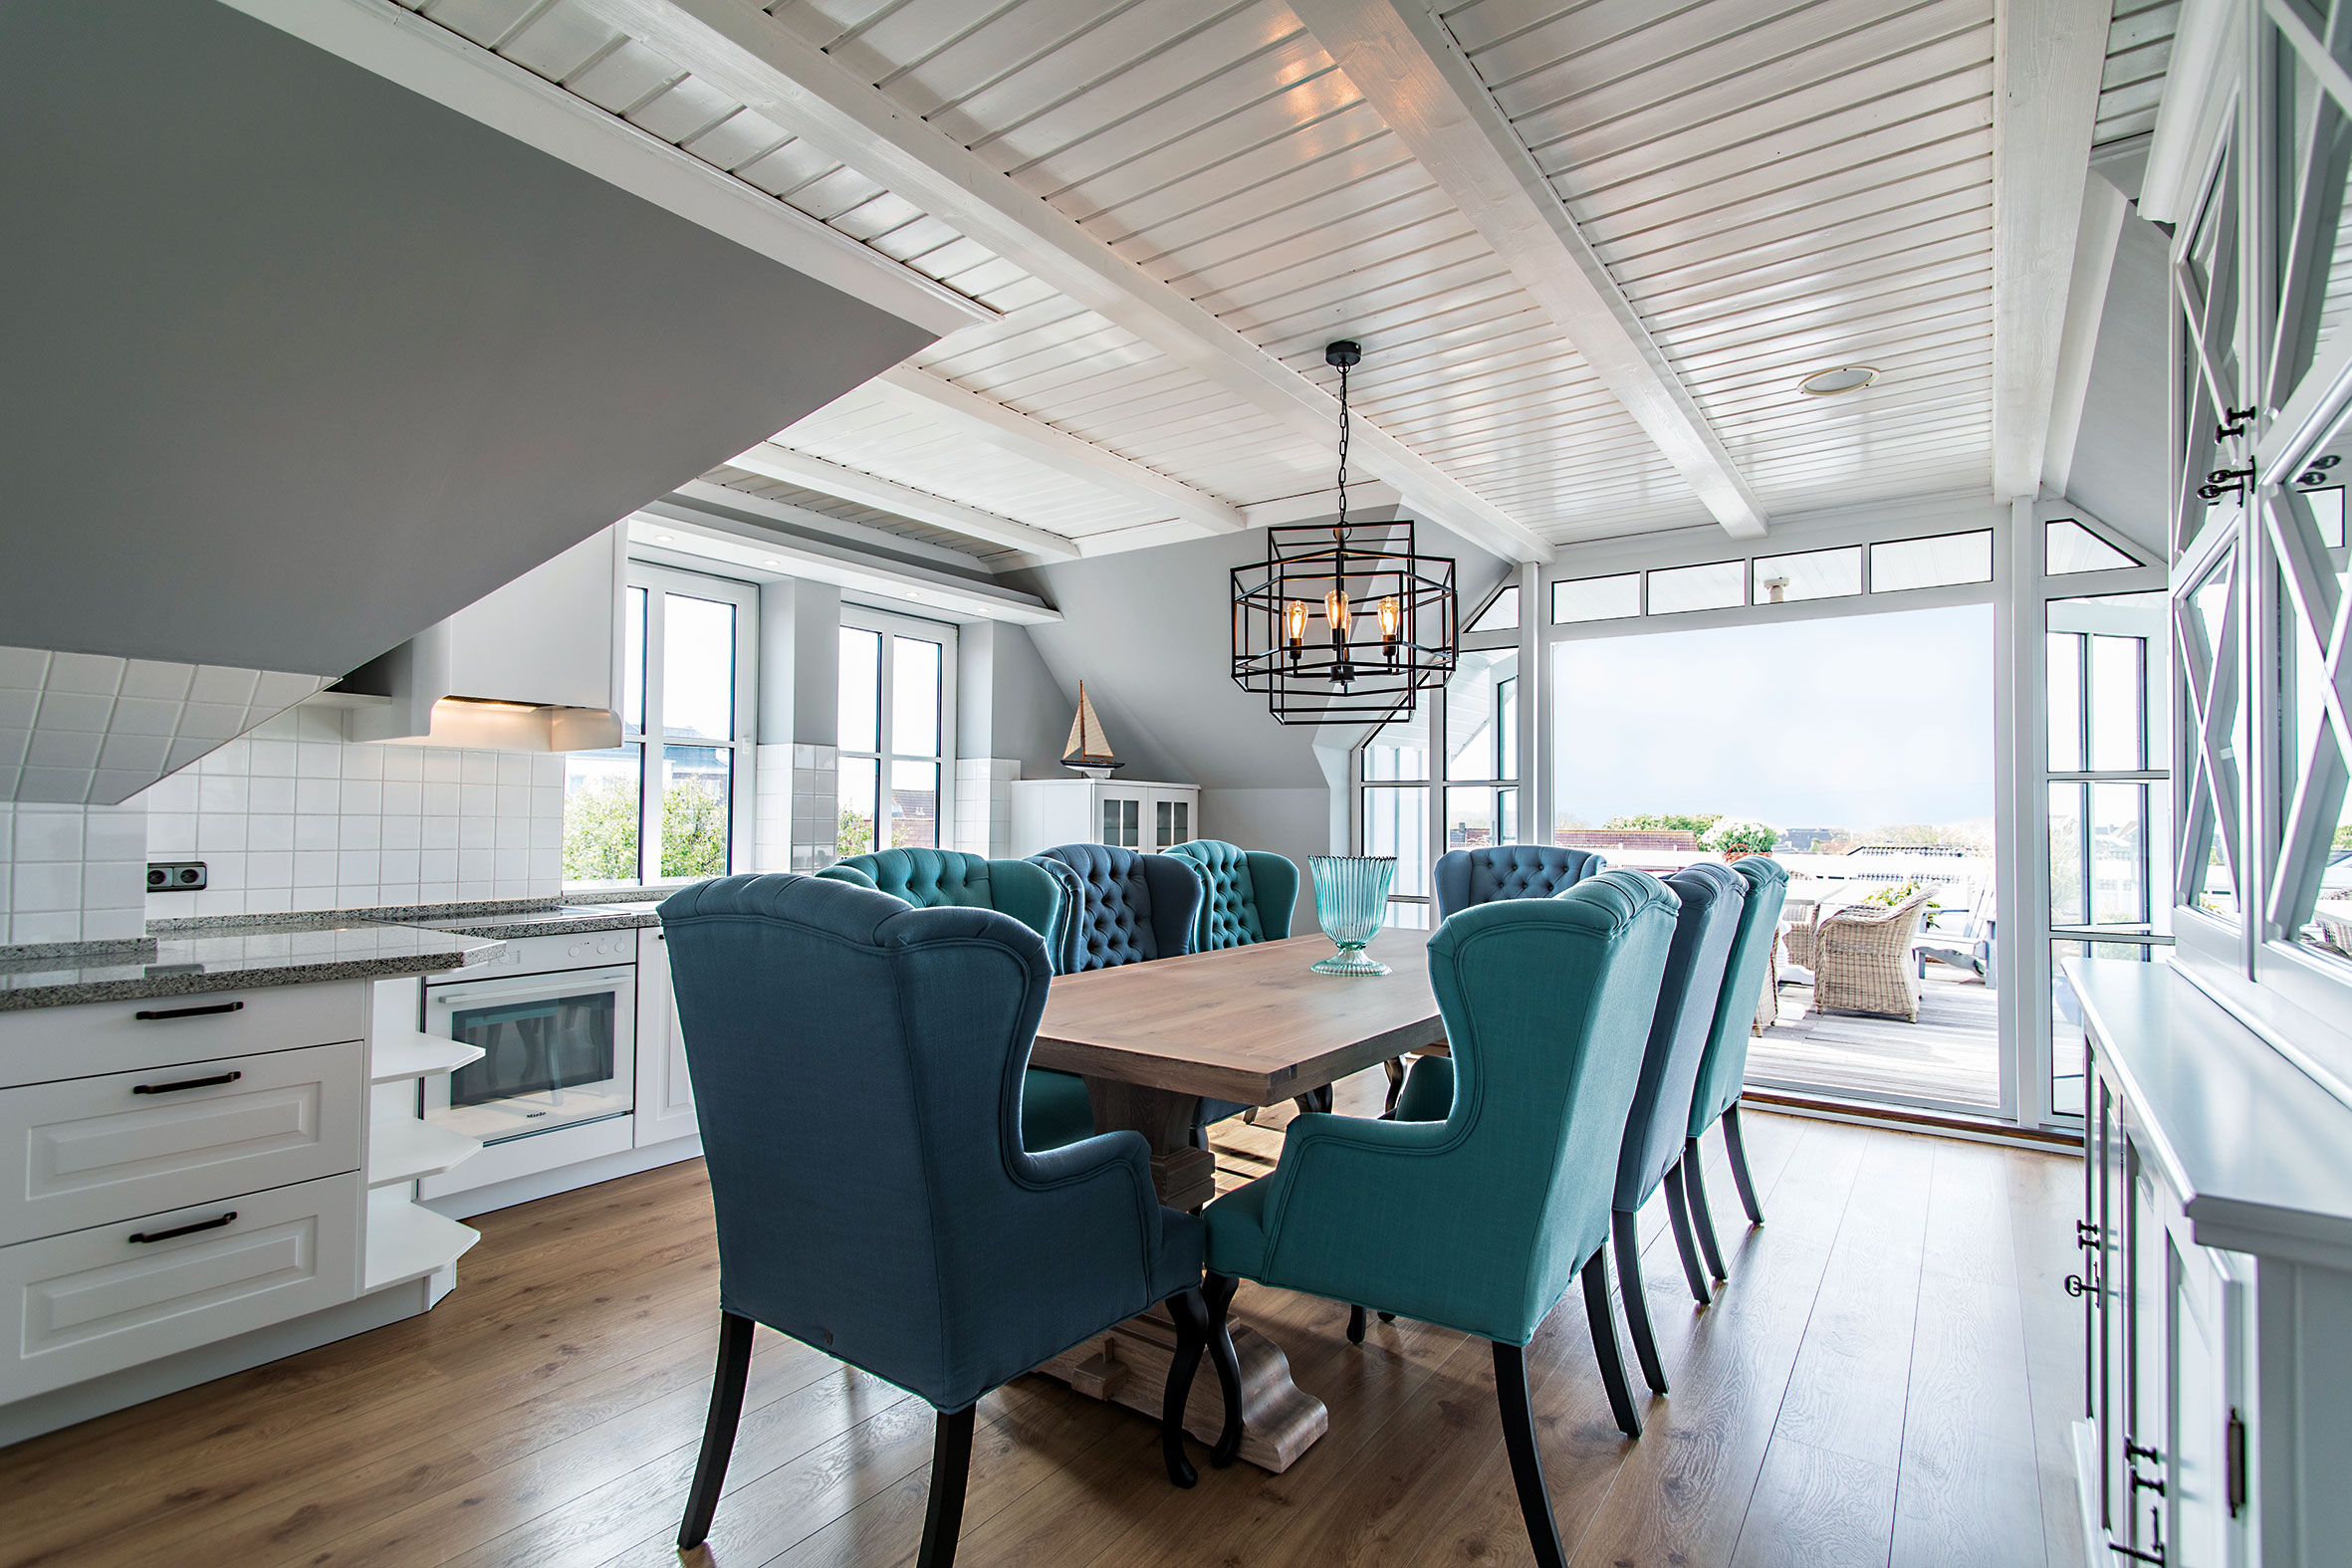 Penthouse-Küche